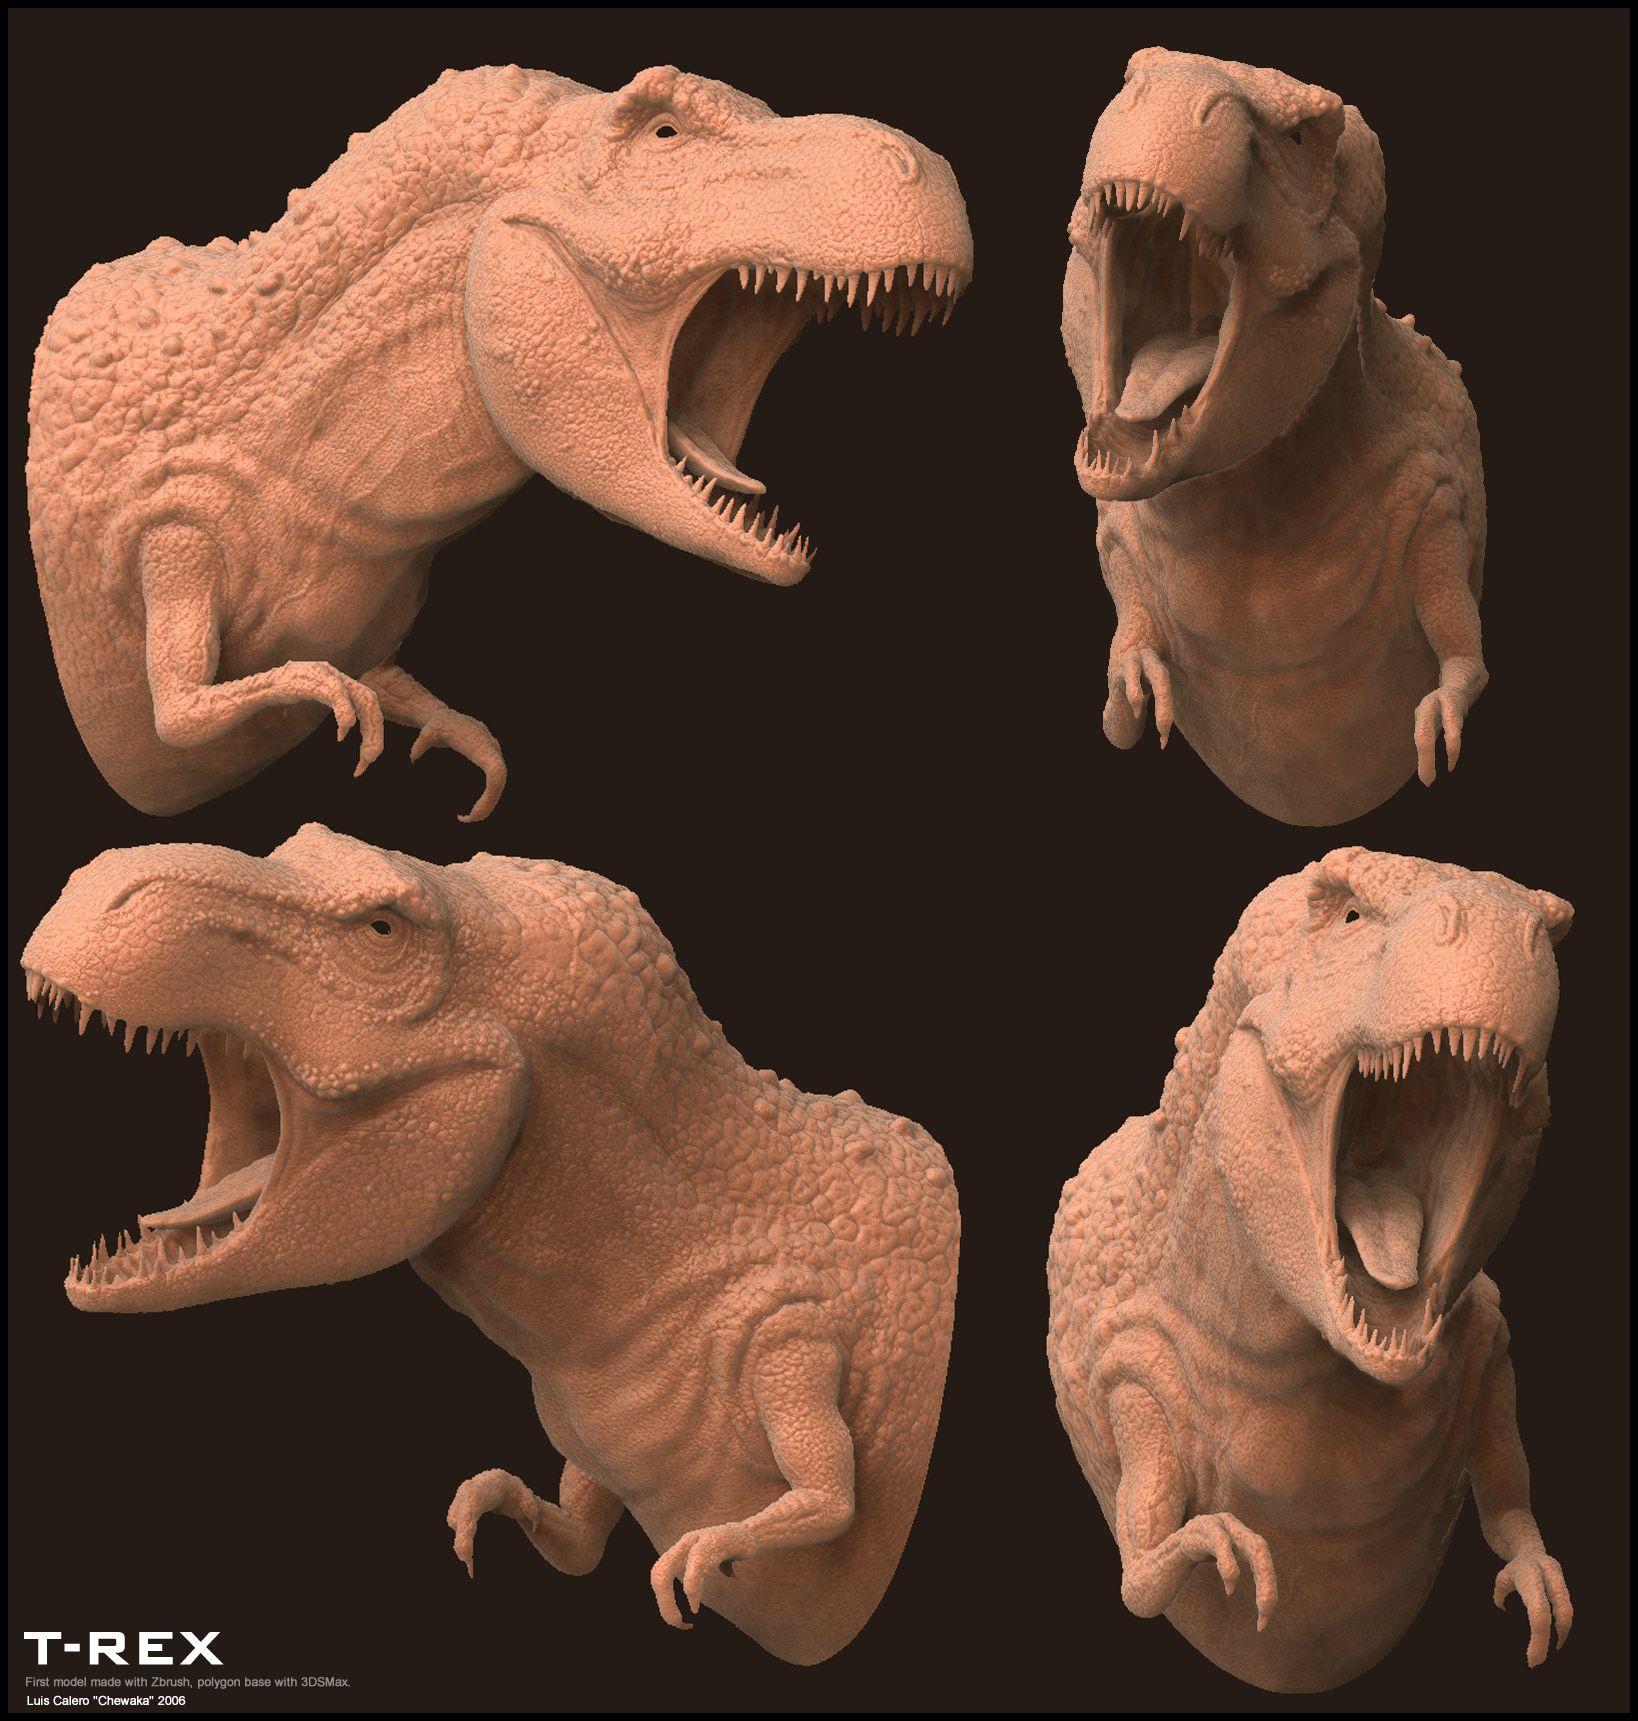 T-rex: Primer Modelo Con Zbrush